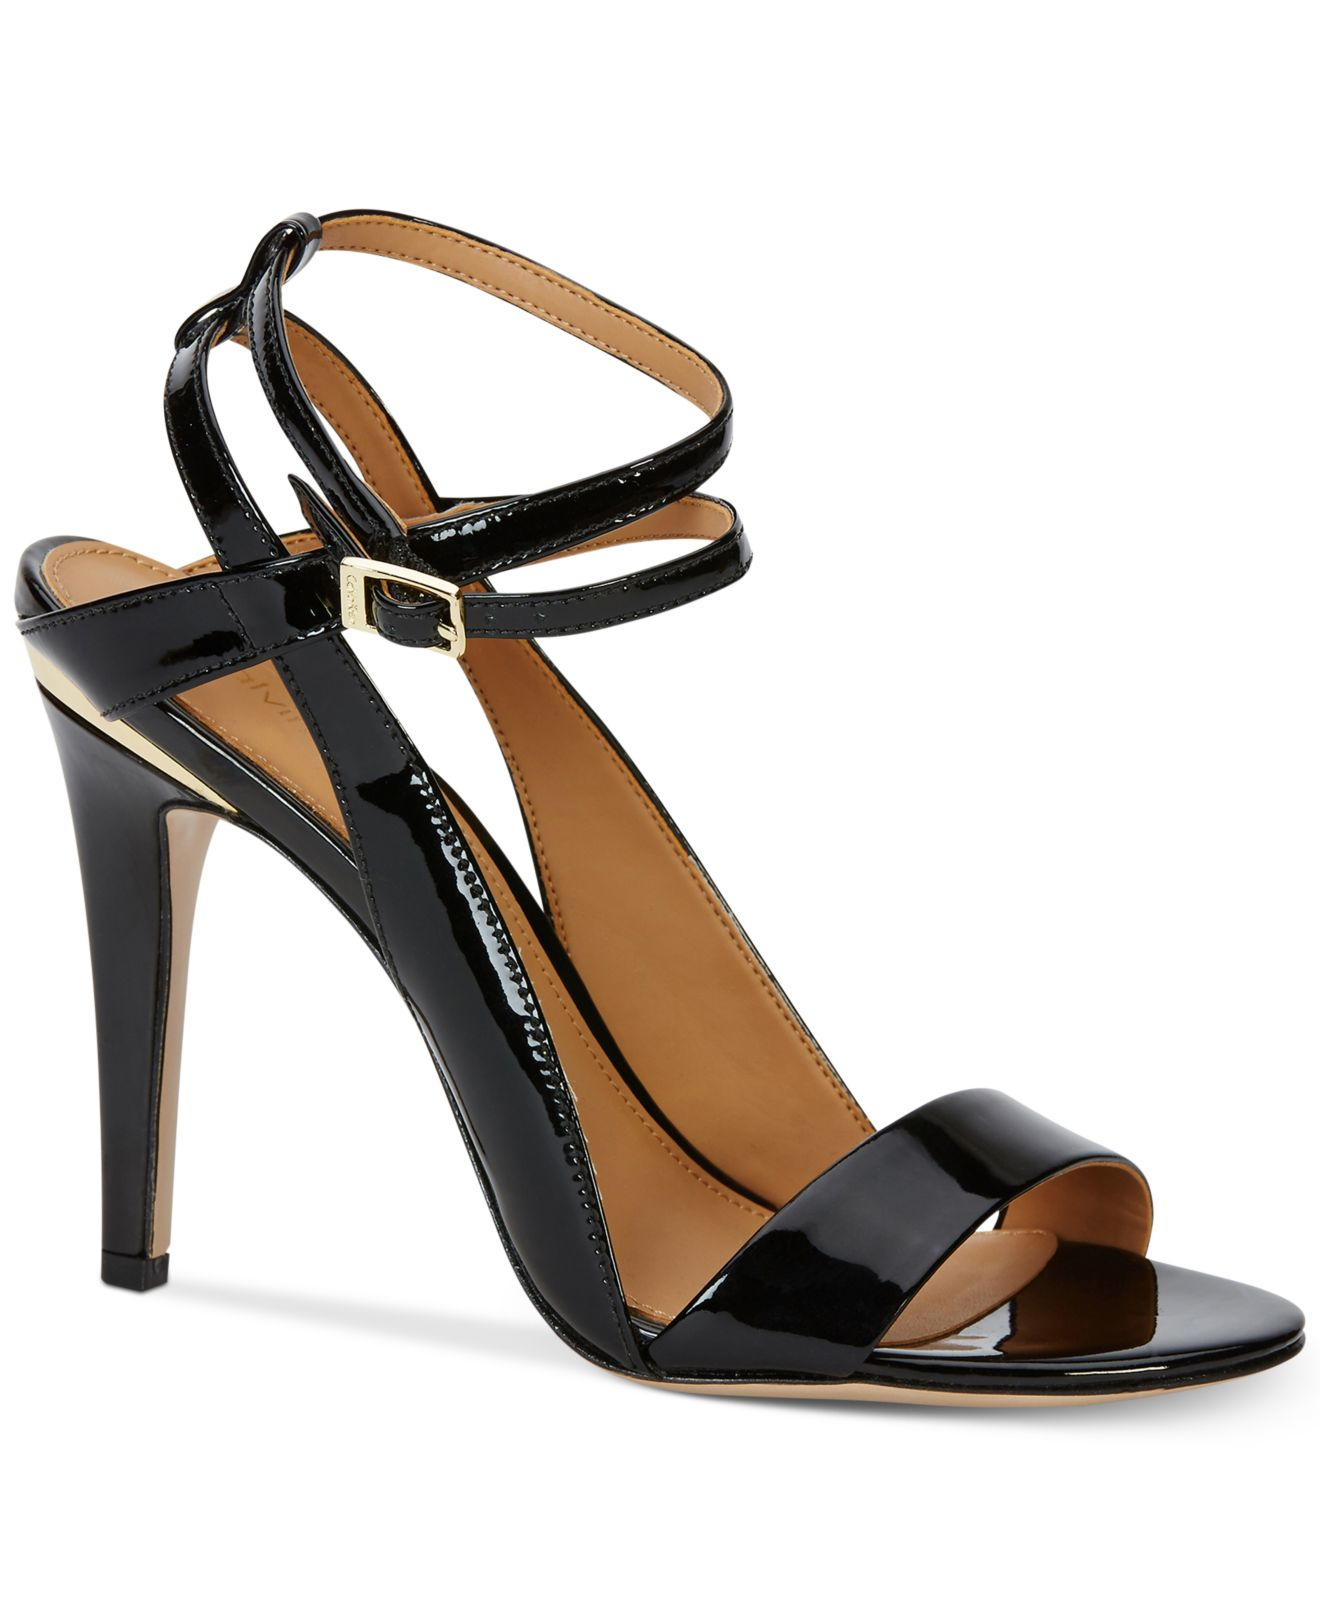 61a3fdc3dfc0f2 calvin klein black sandals lyst calvin klein s melville ankle sandals